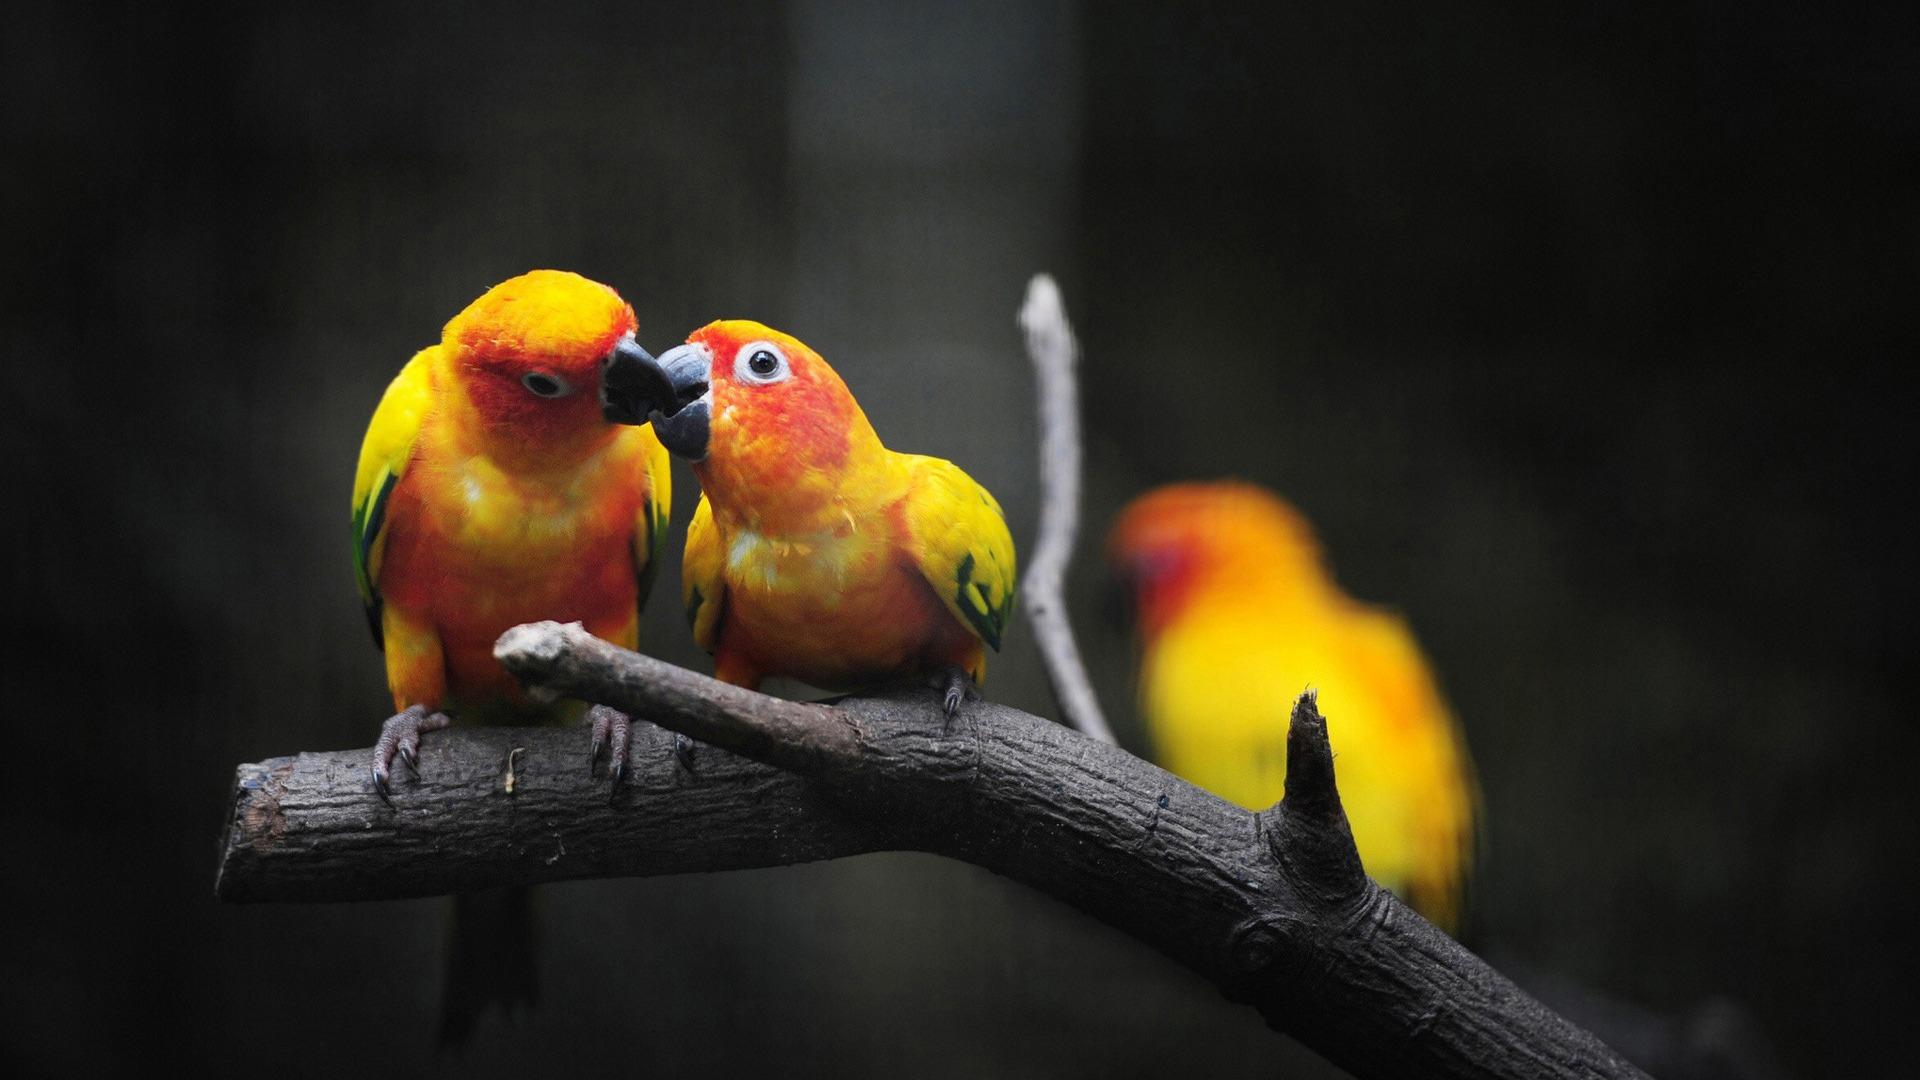 Love Birds Hd Wallpapers: Cute Love Birds Kissing-Photo HD Wallpaper Preview